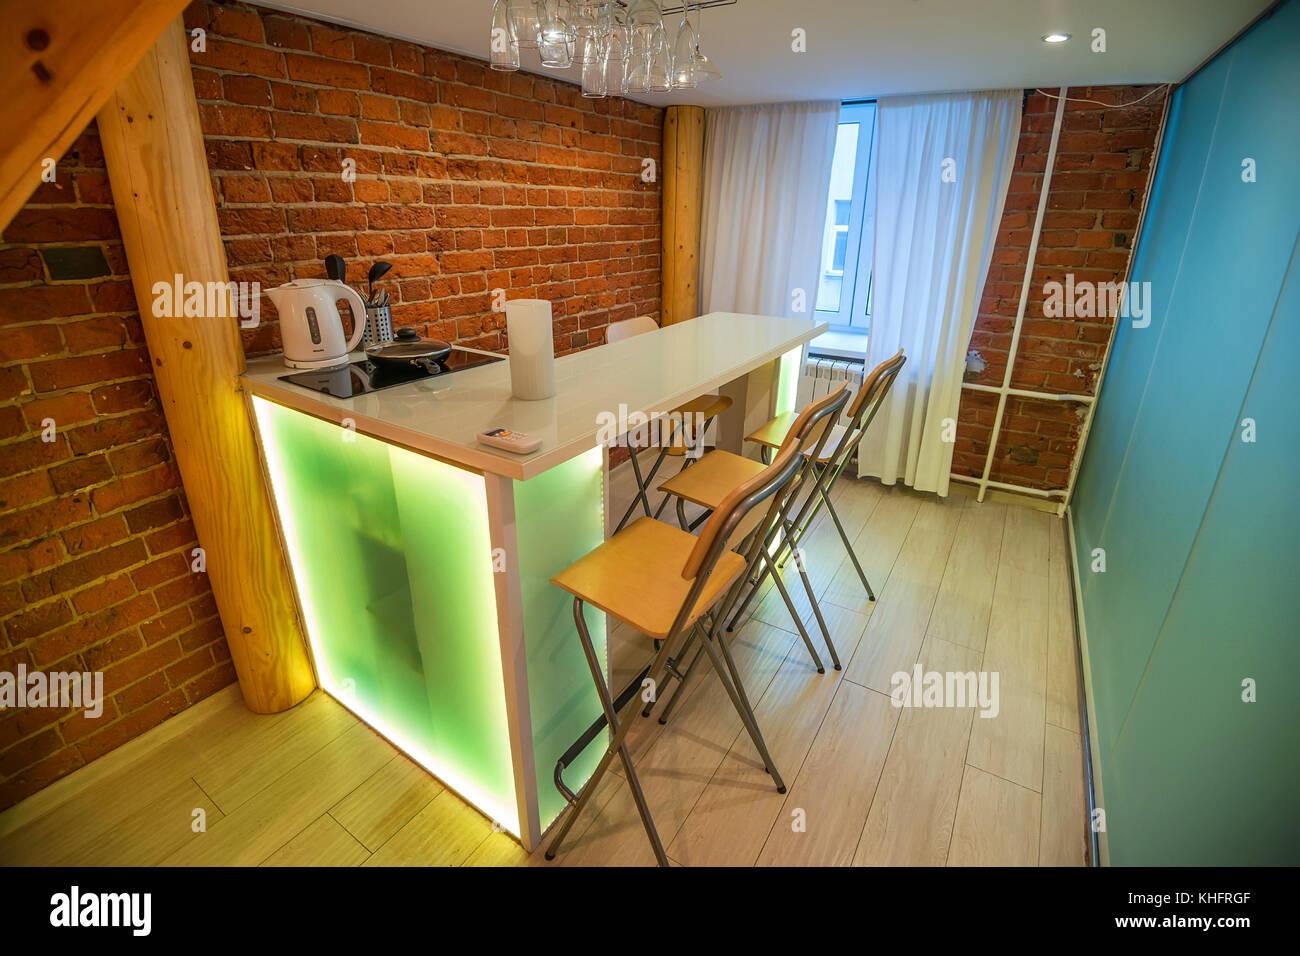 Interior Design Diy Stockfotos & Interior Design Diy Bilder - Alamy